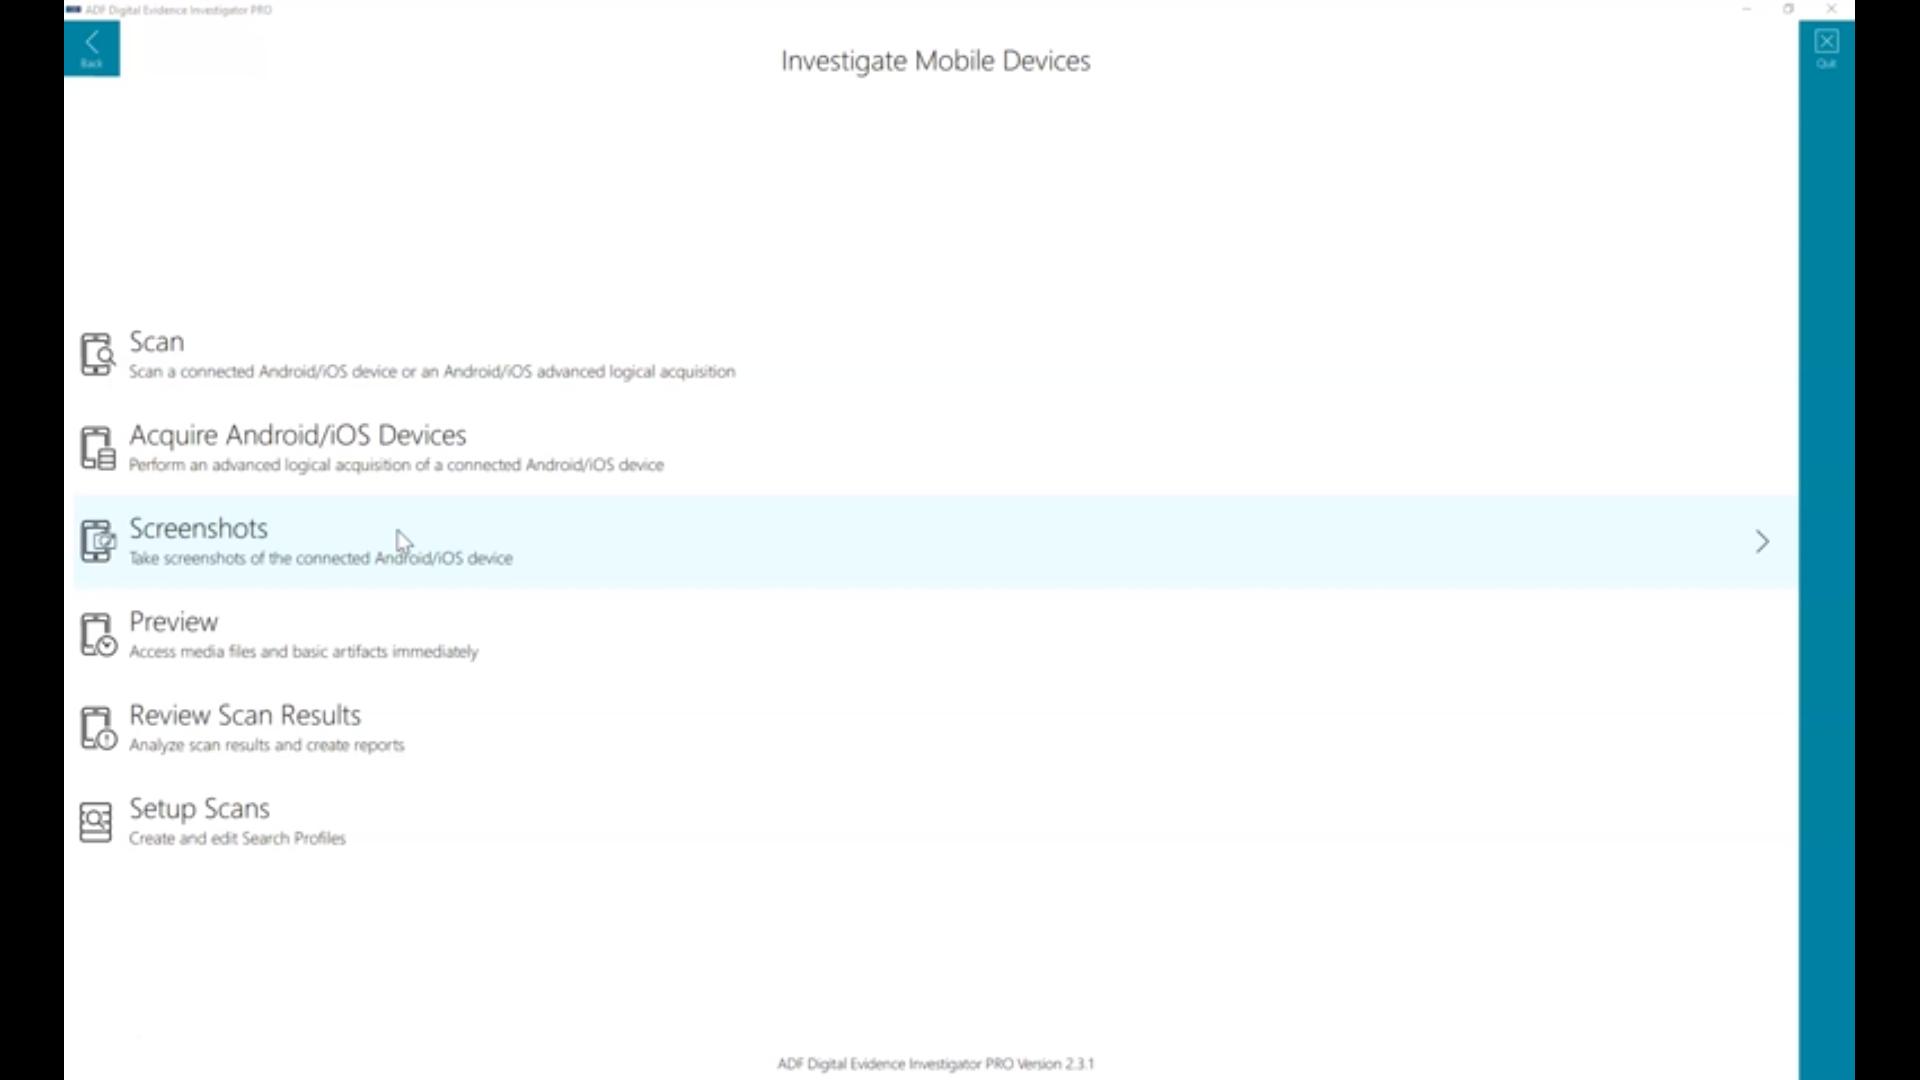 Digital Evidence Investigator device scan